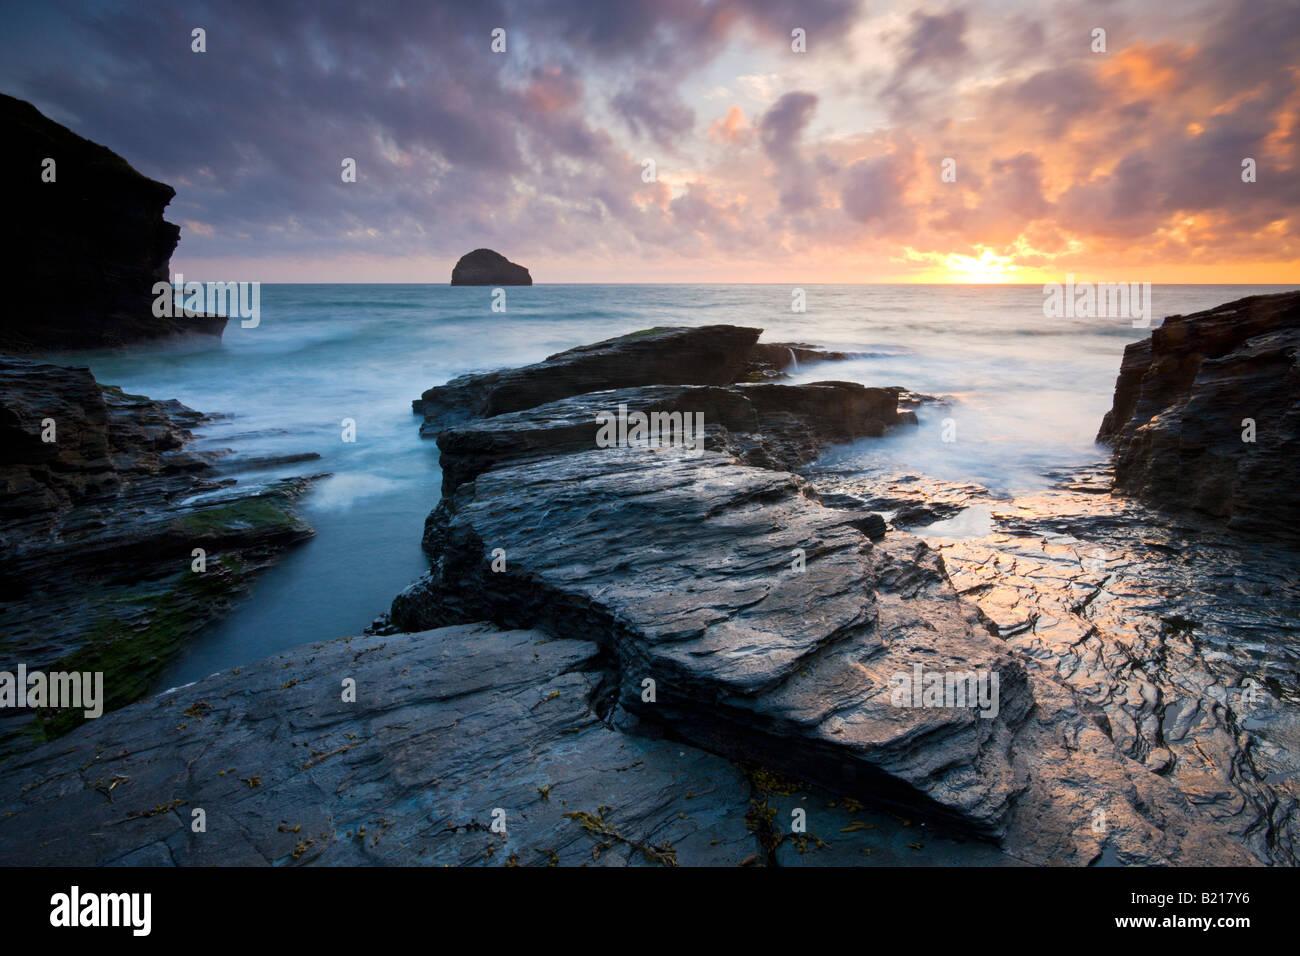 Trebarwith Strand and Gull Rock at sunset Cornwall England - Stock Image